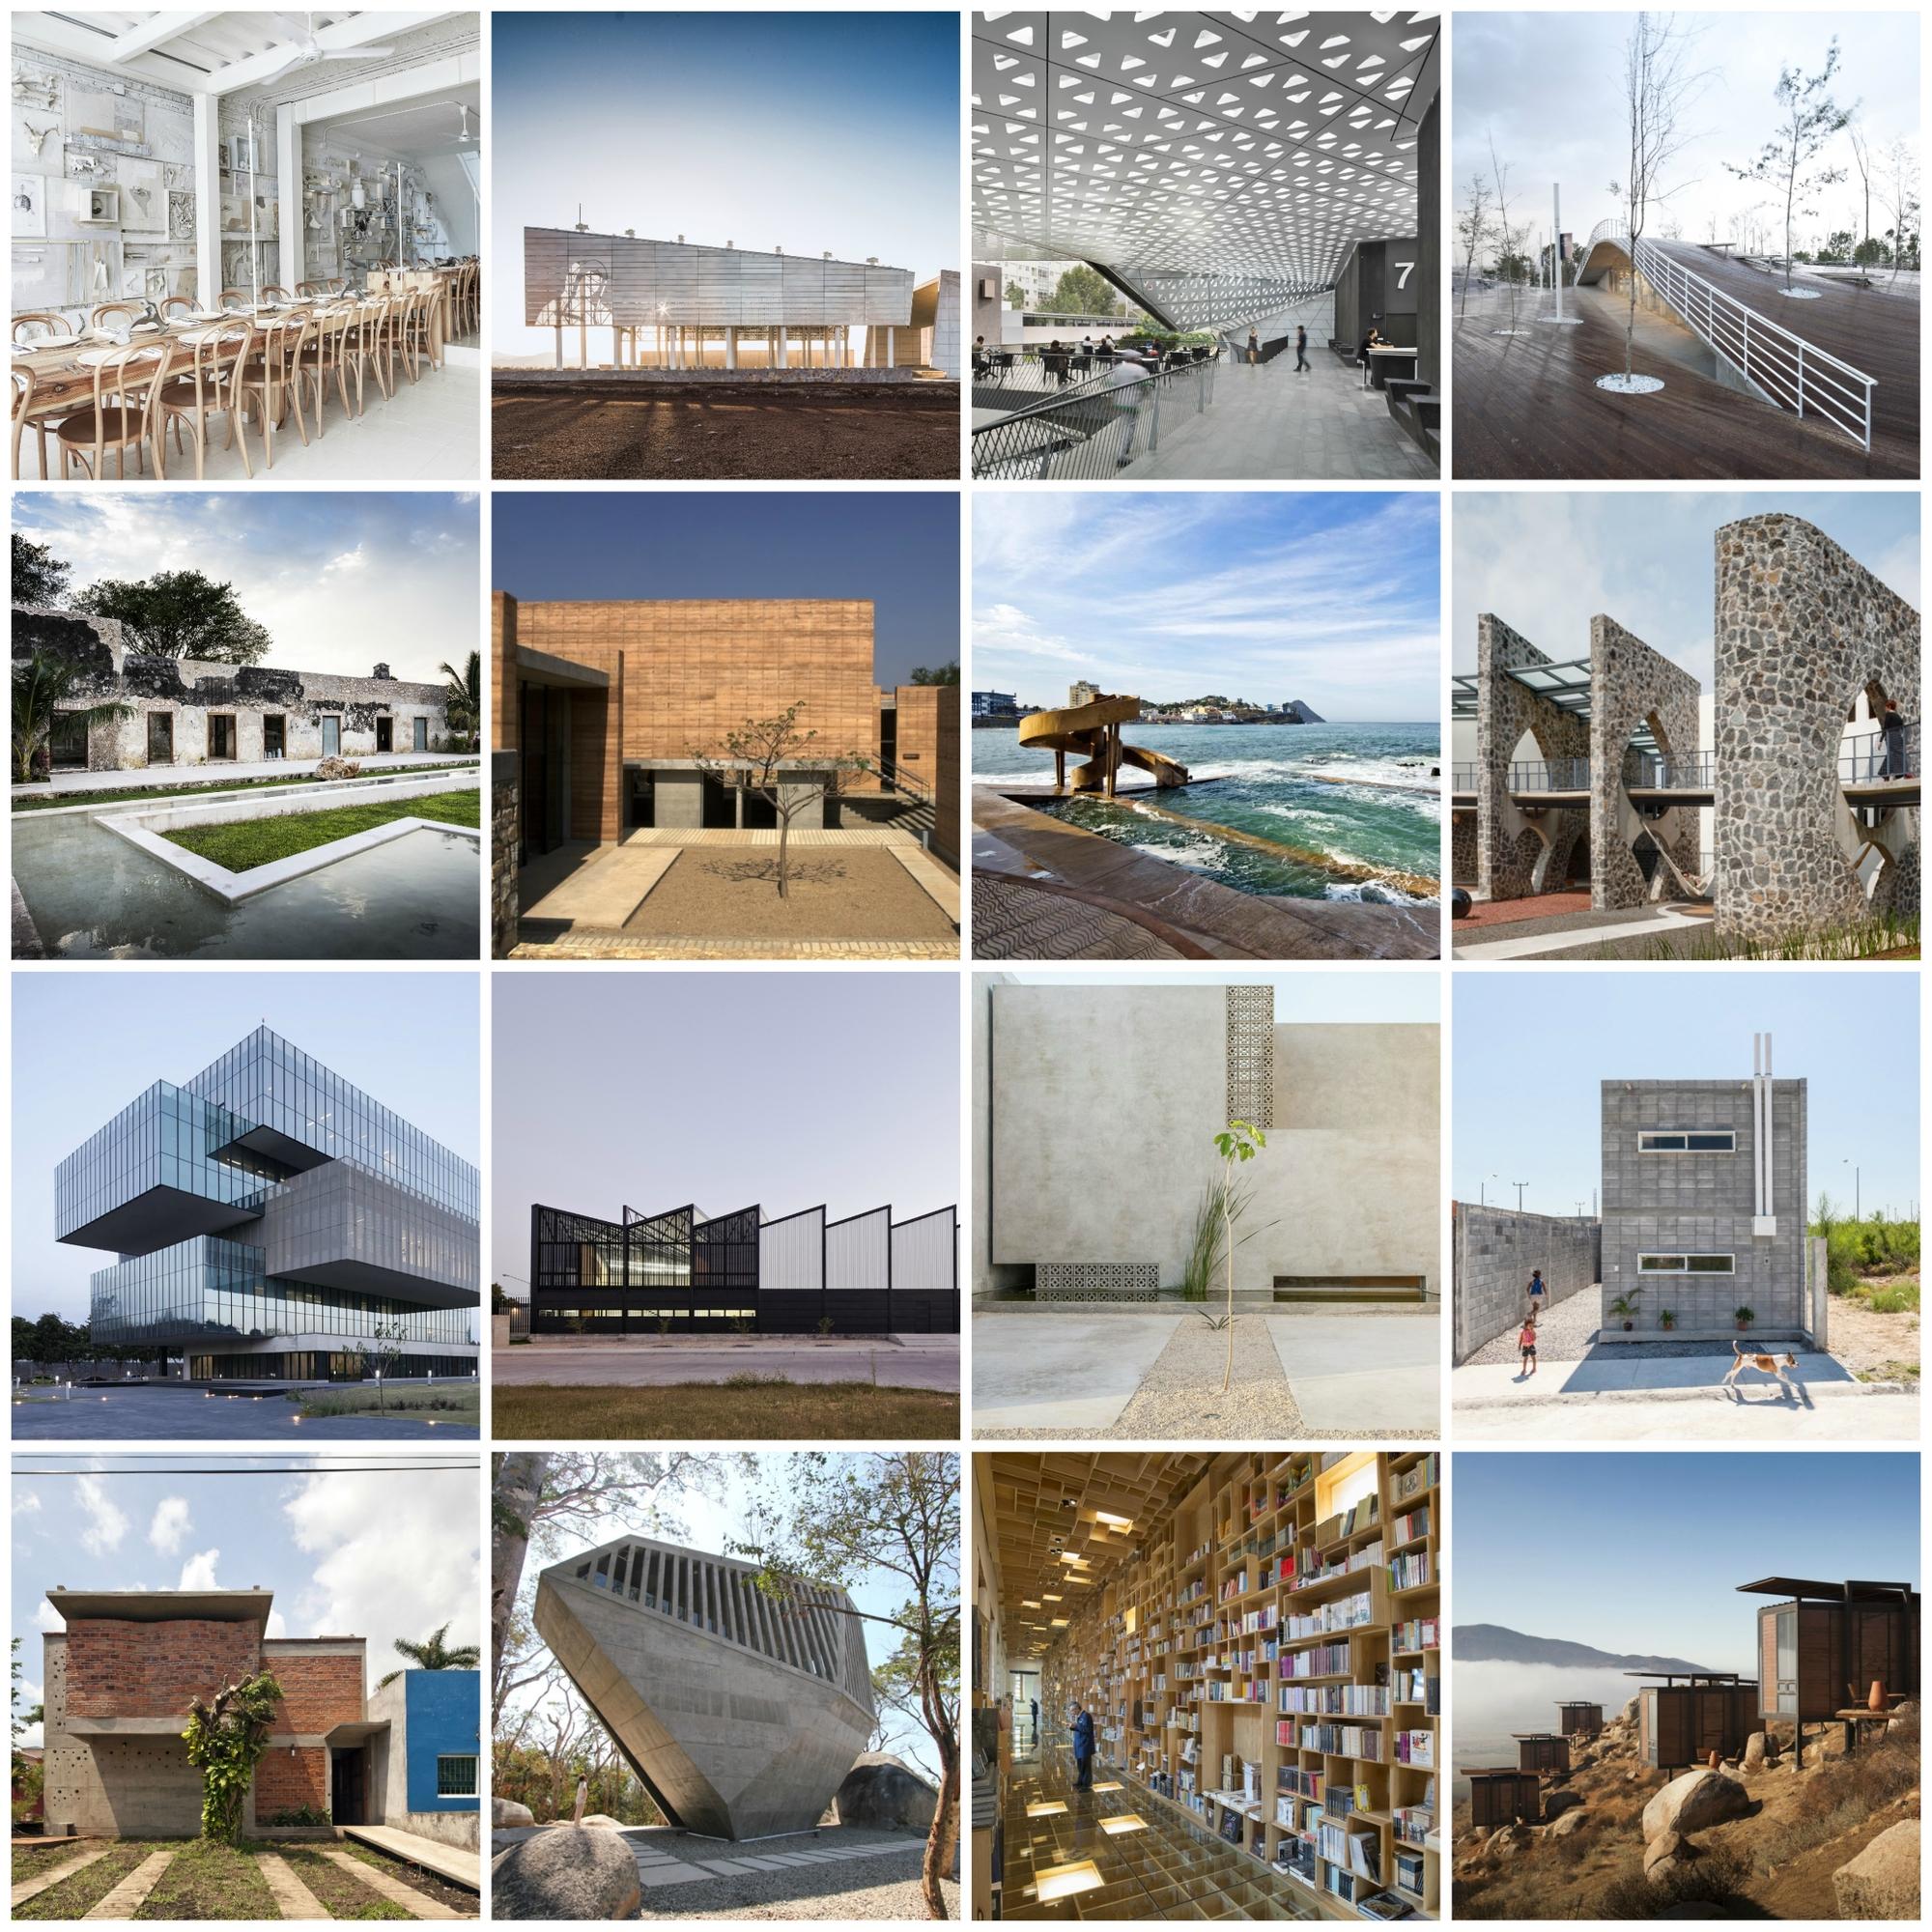 Especial fiestas patrias obras arquitect nicas for Sitios web de arquitectura